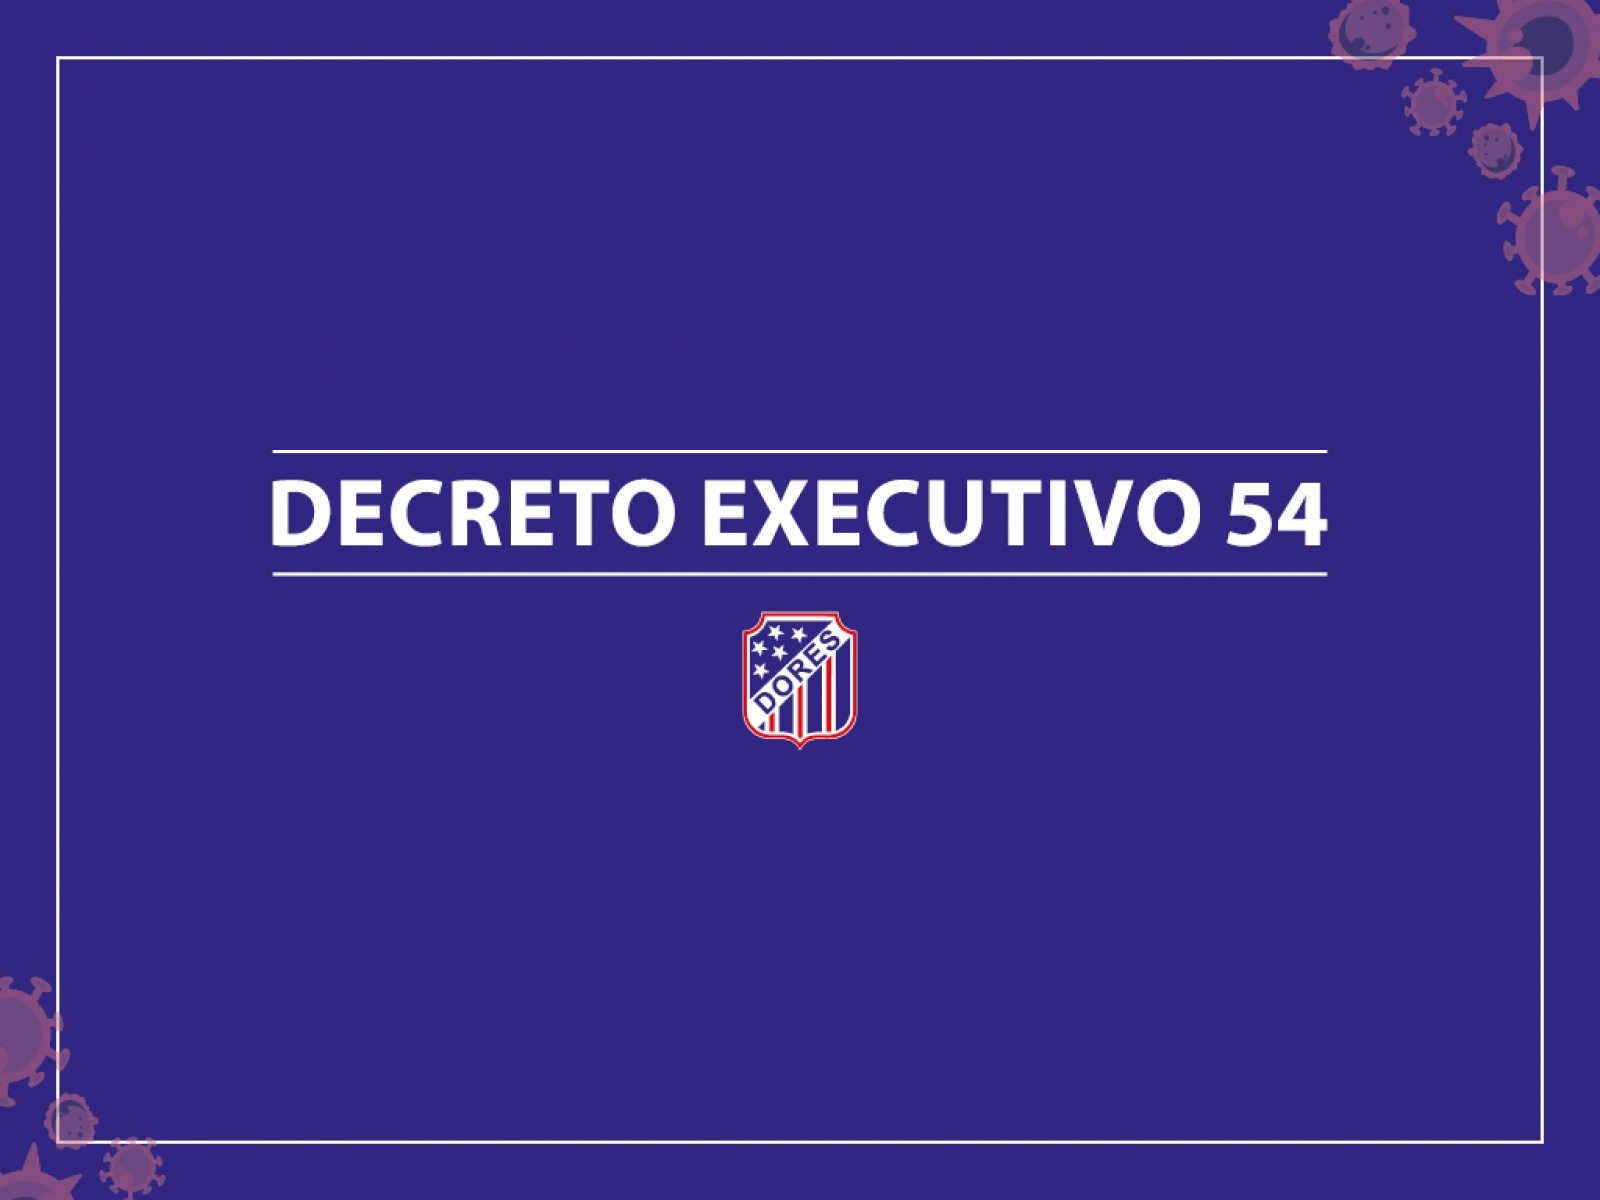 Decreto Executivo 54